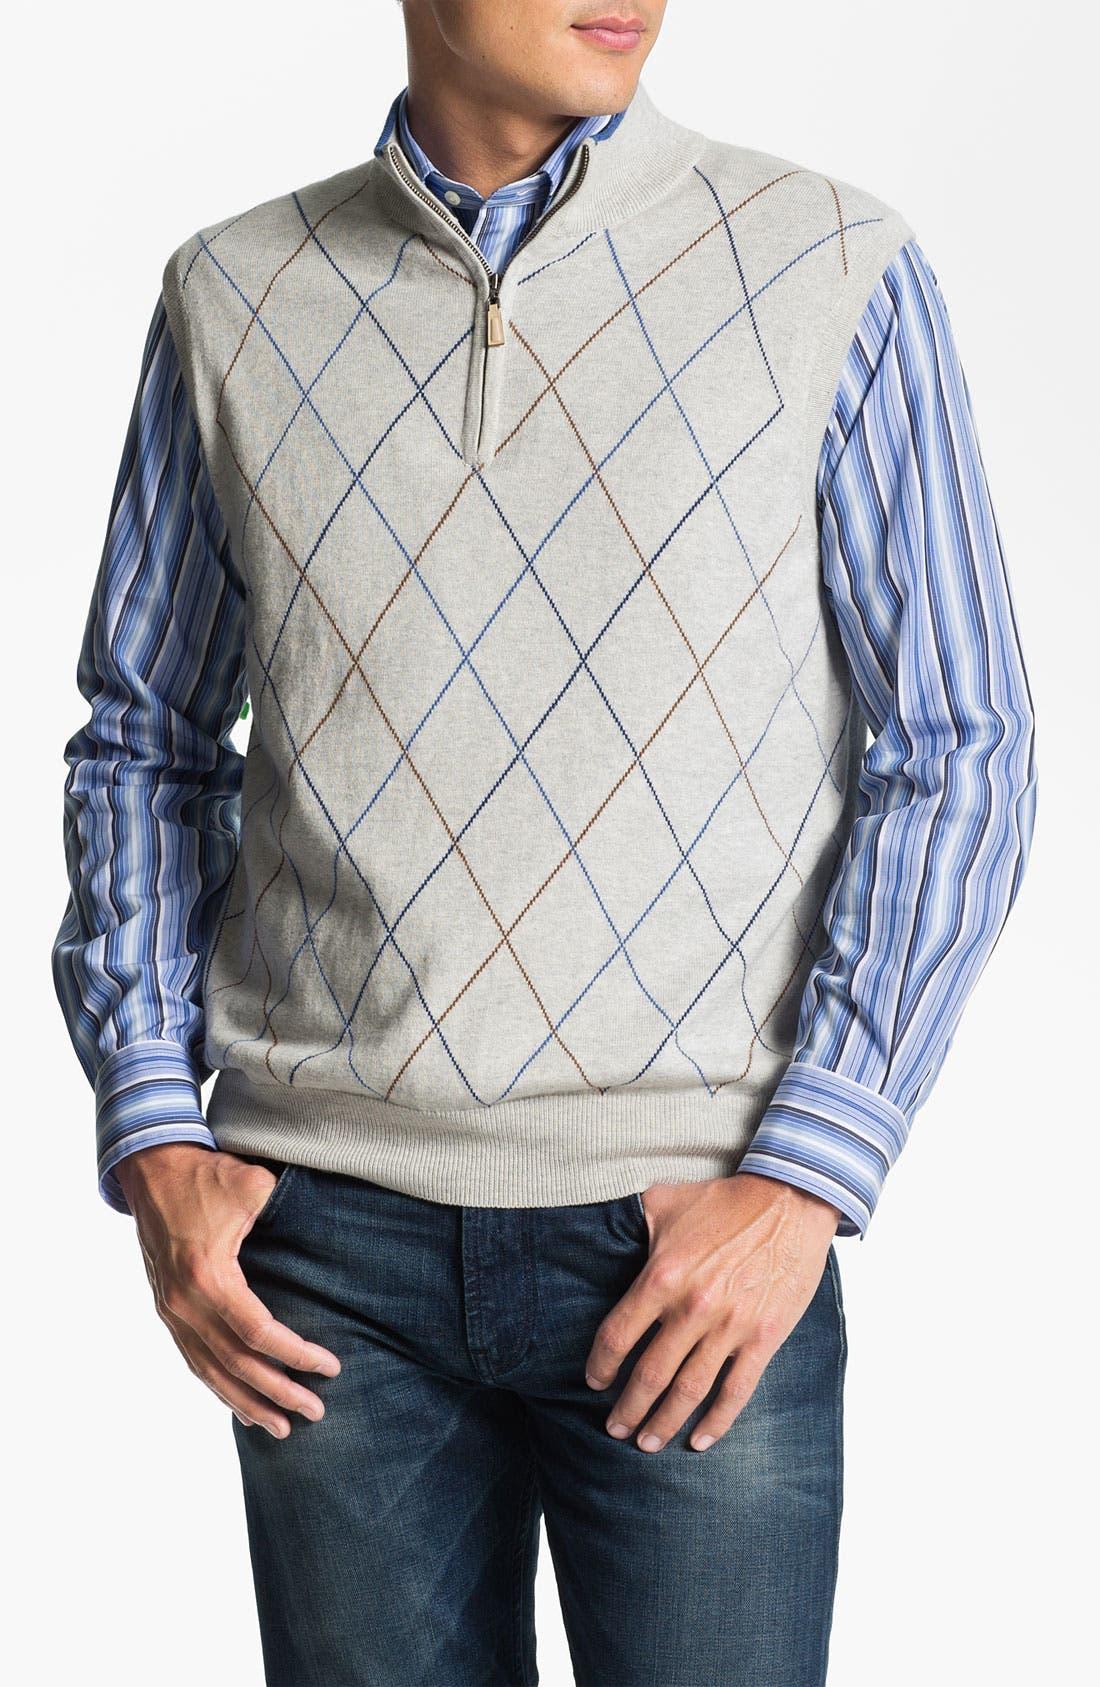 Alternate Image 1 Selected - Peter Millar Quarter Zip Cotton & Cashmere Sweater Vest